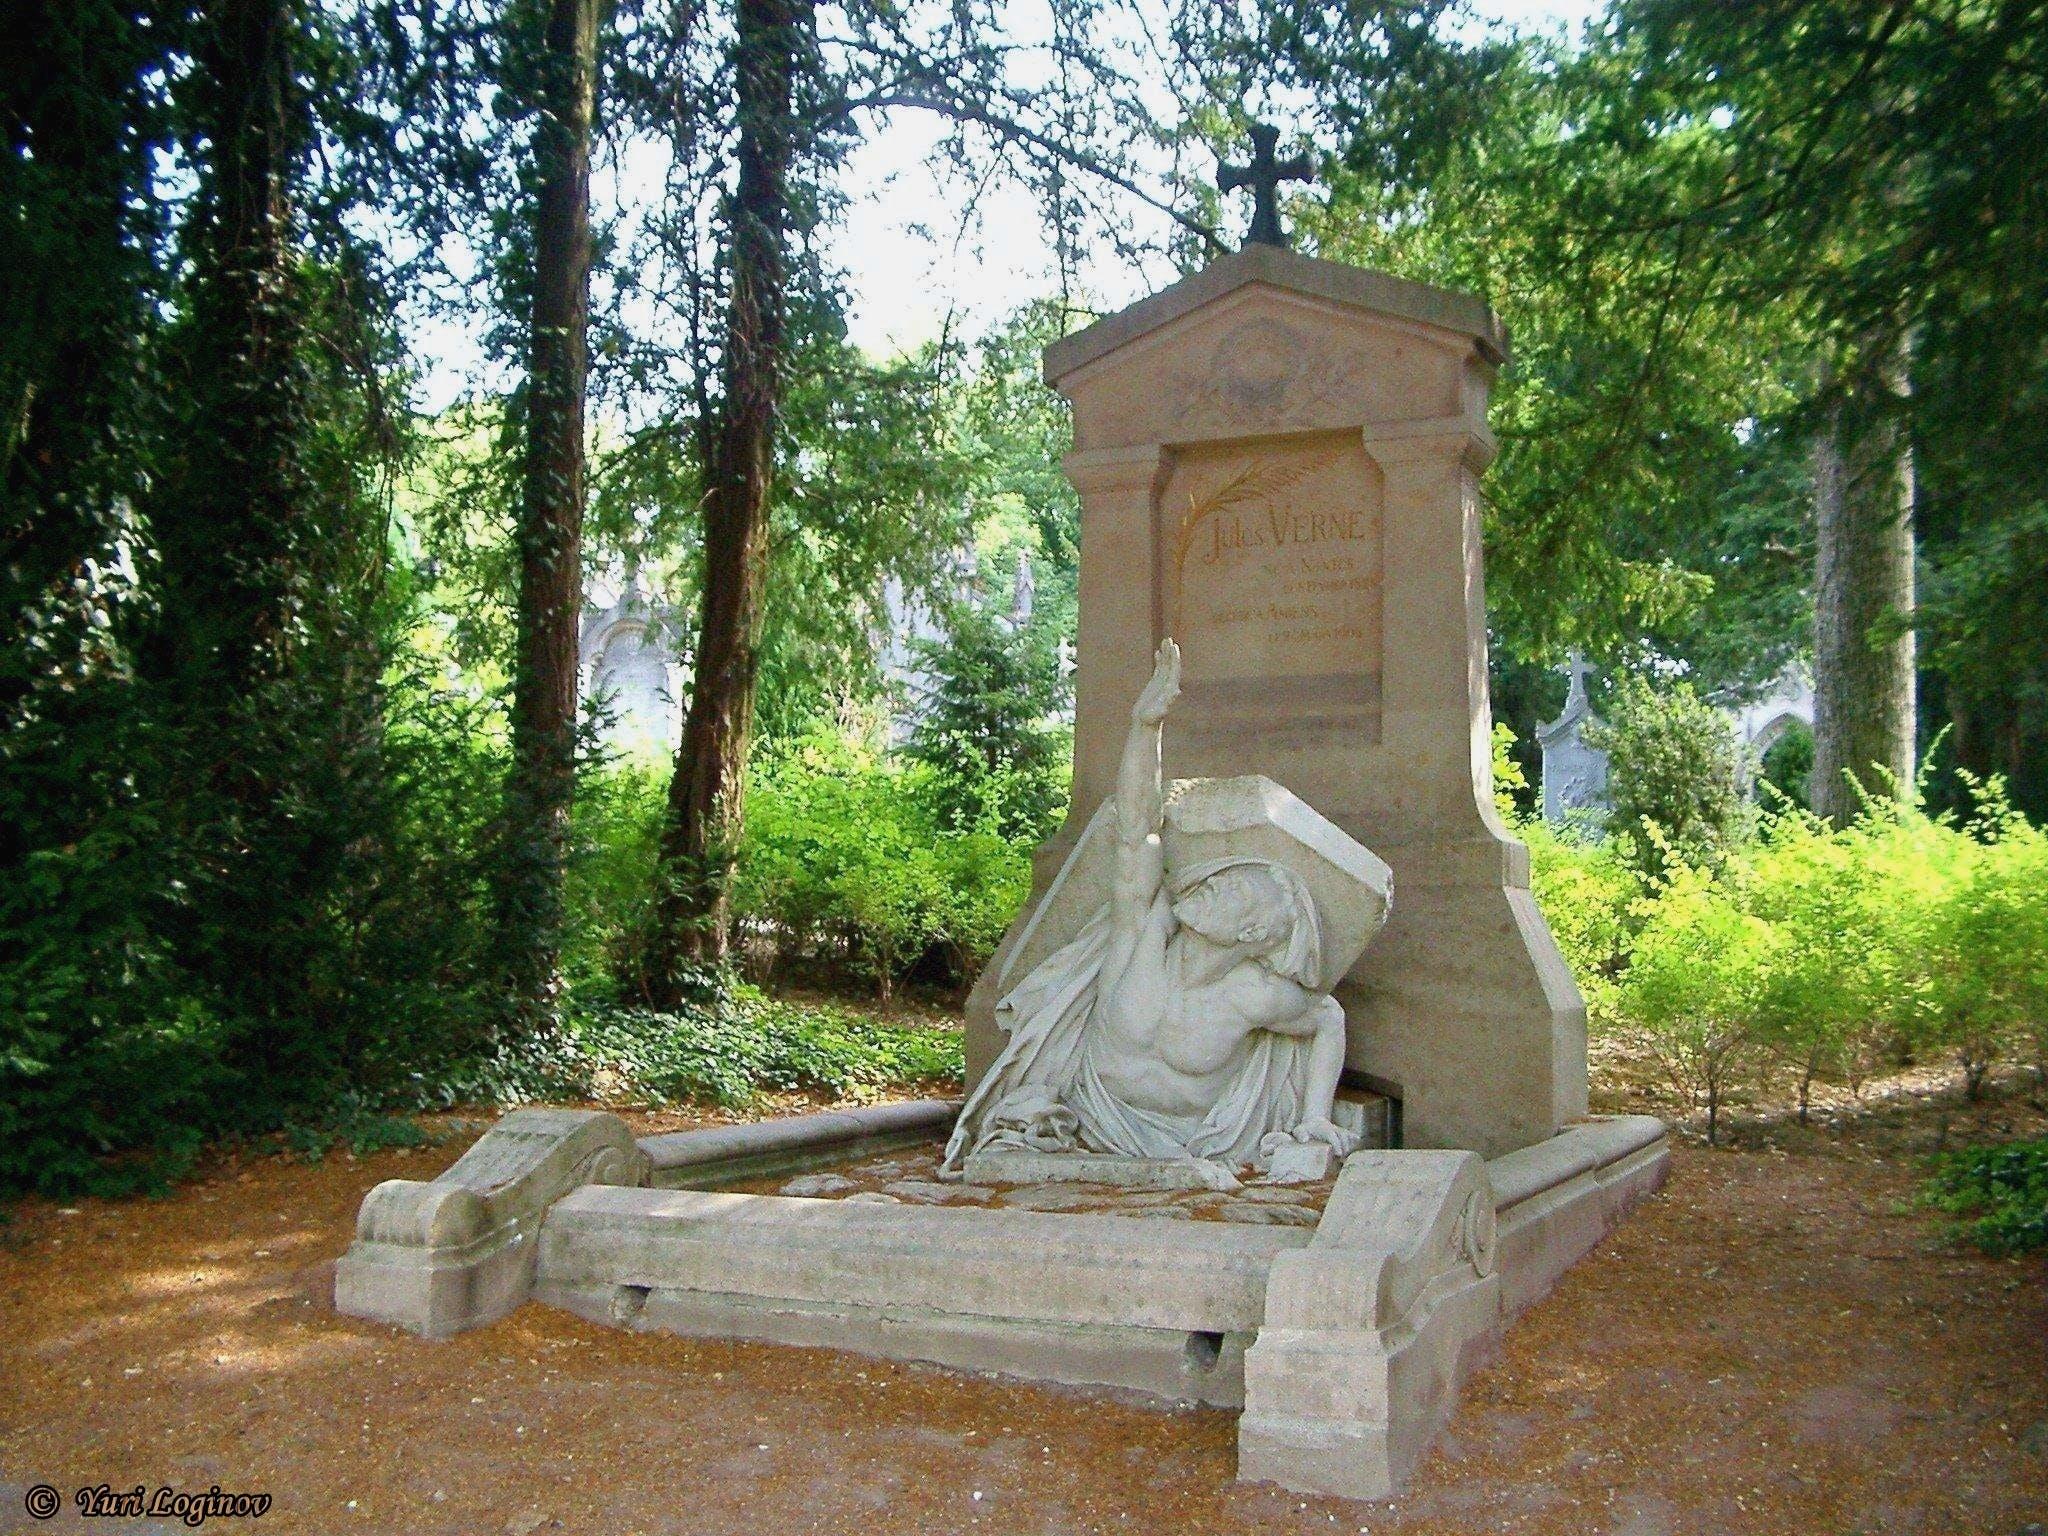 Free stock photo of Amiens, Cimetiere de la Madeleine, france